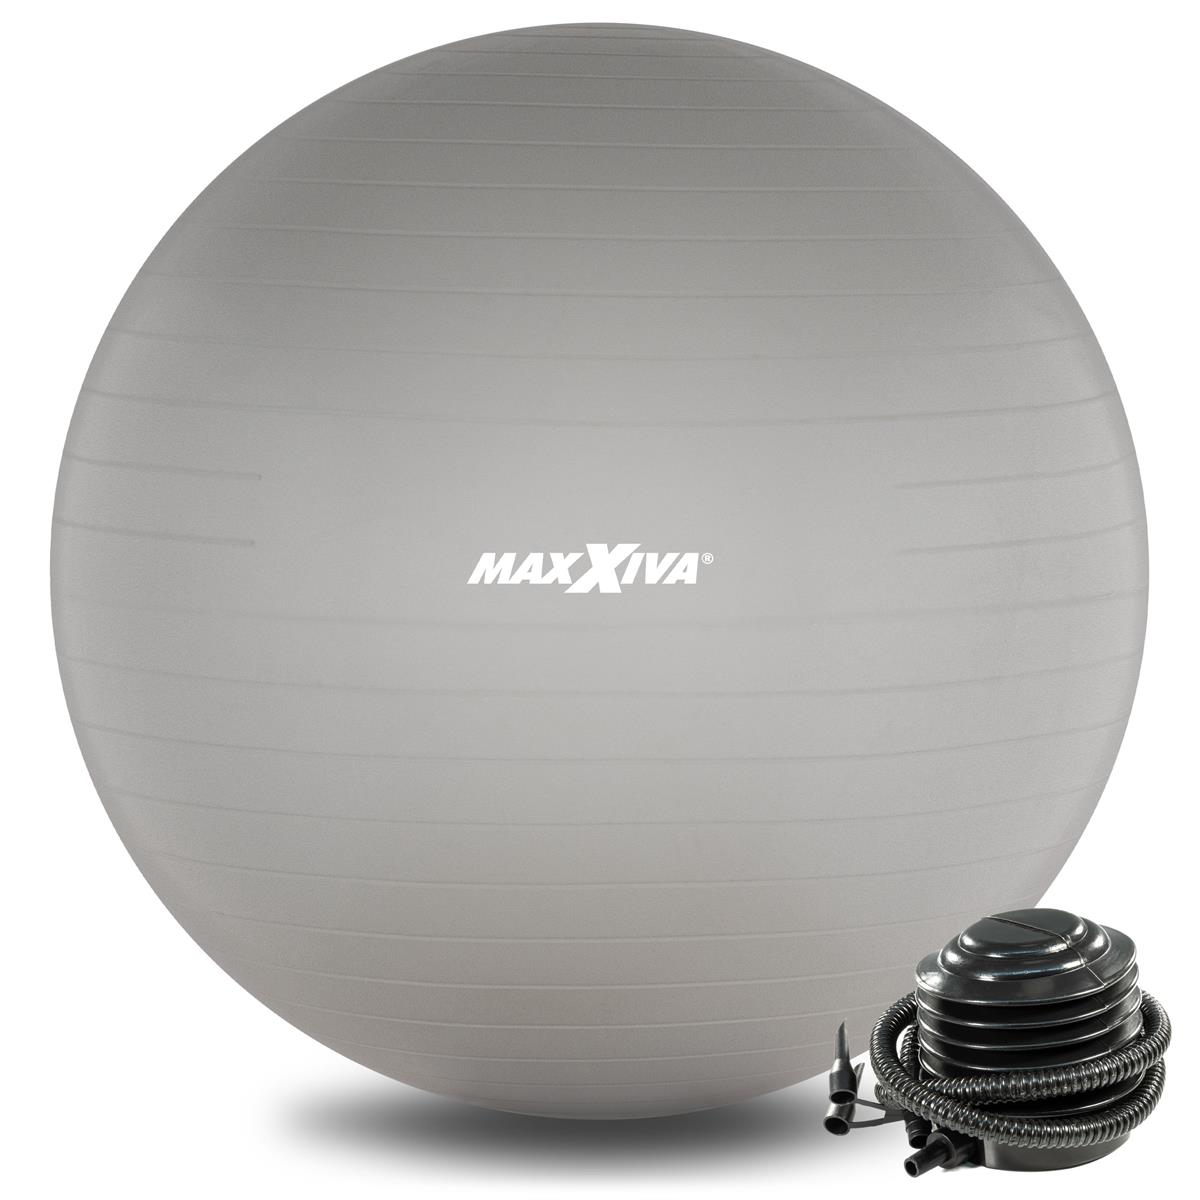 MAXXIVA Gymnastikball Ø 75 cm Silber mit Pumpe Sitzball Fitness Yoga Pilates